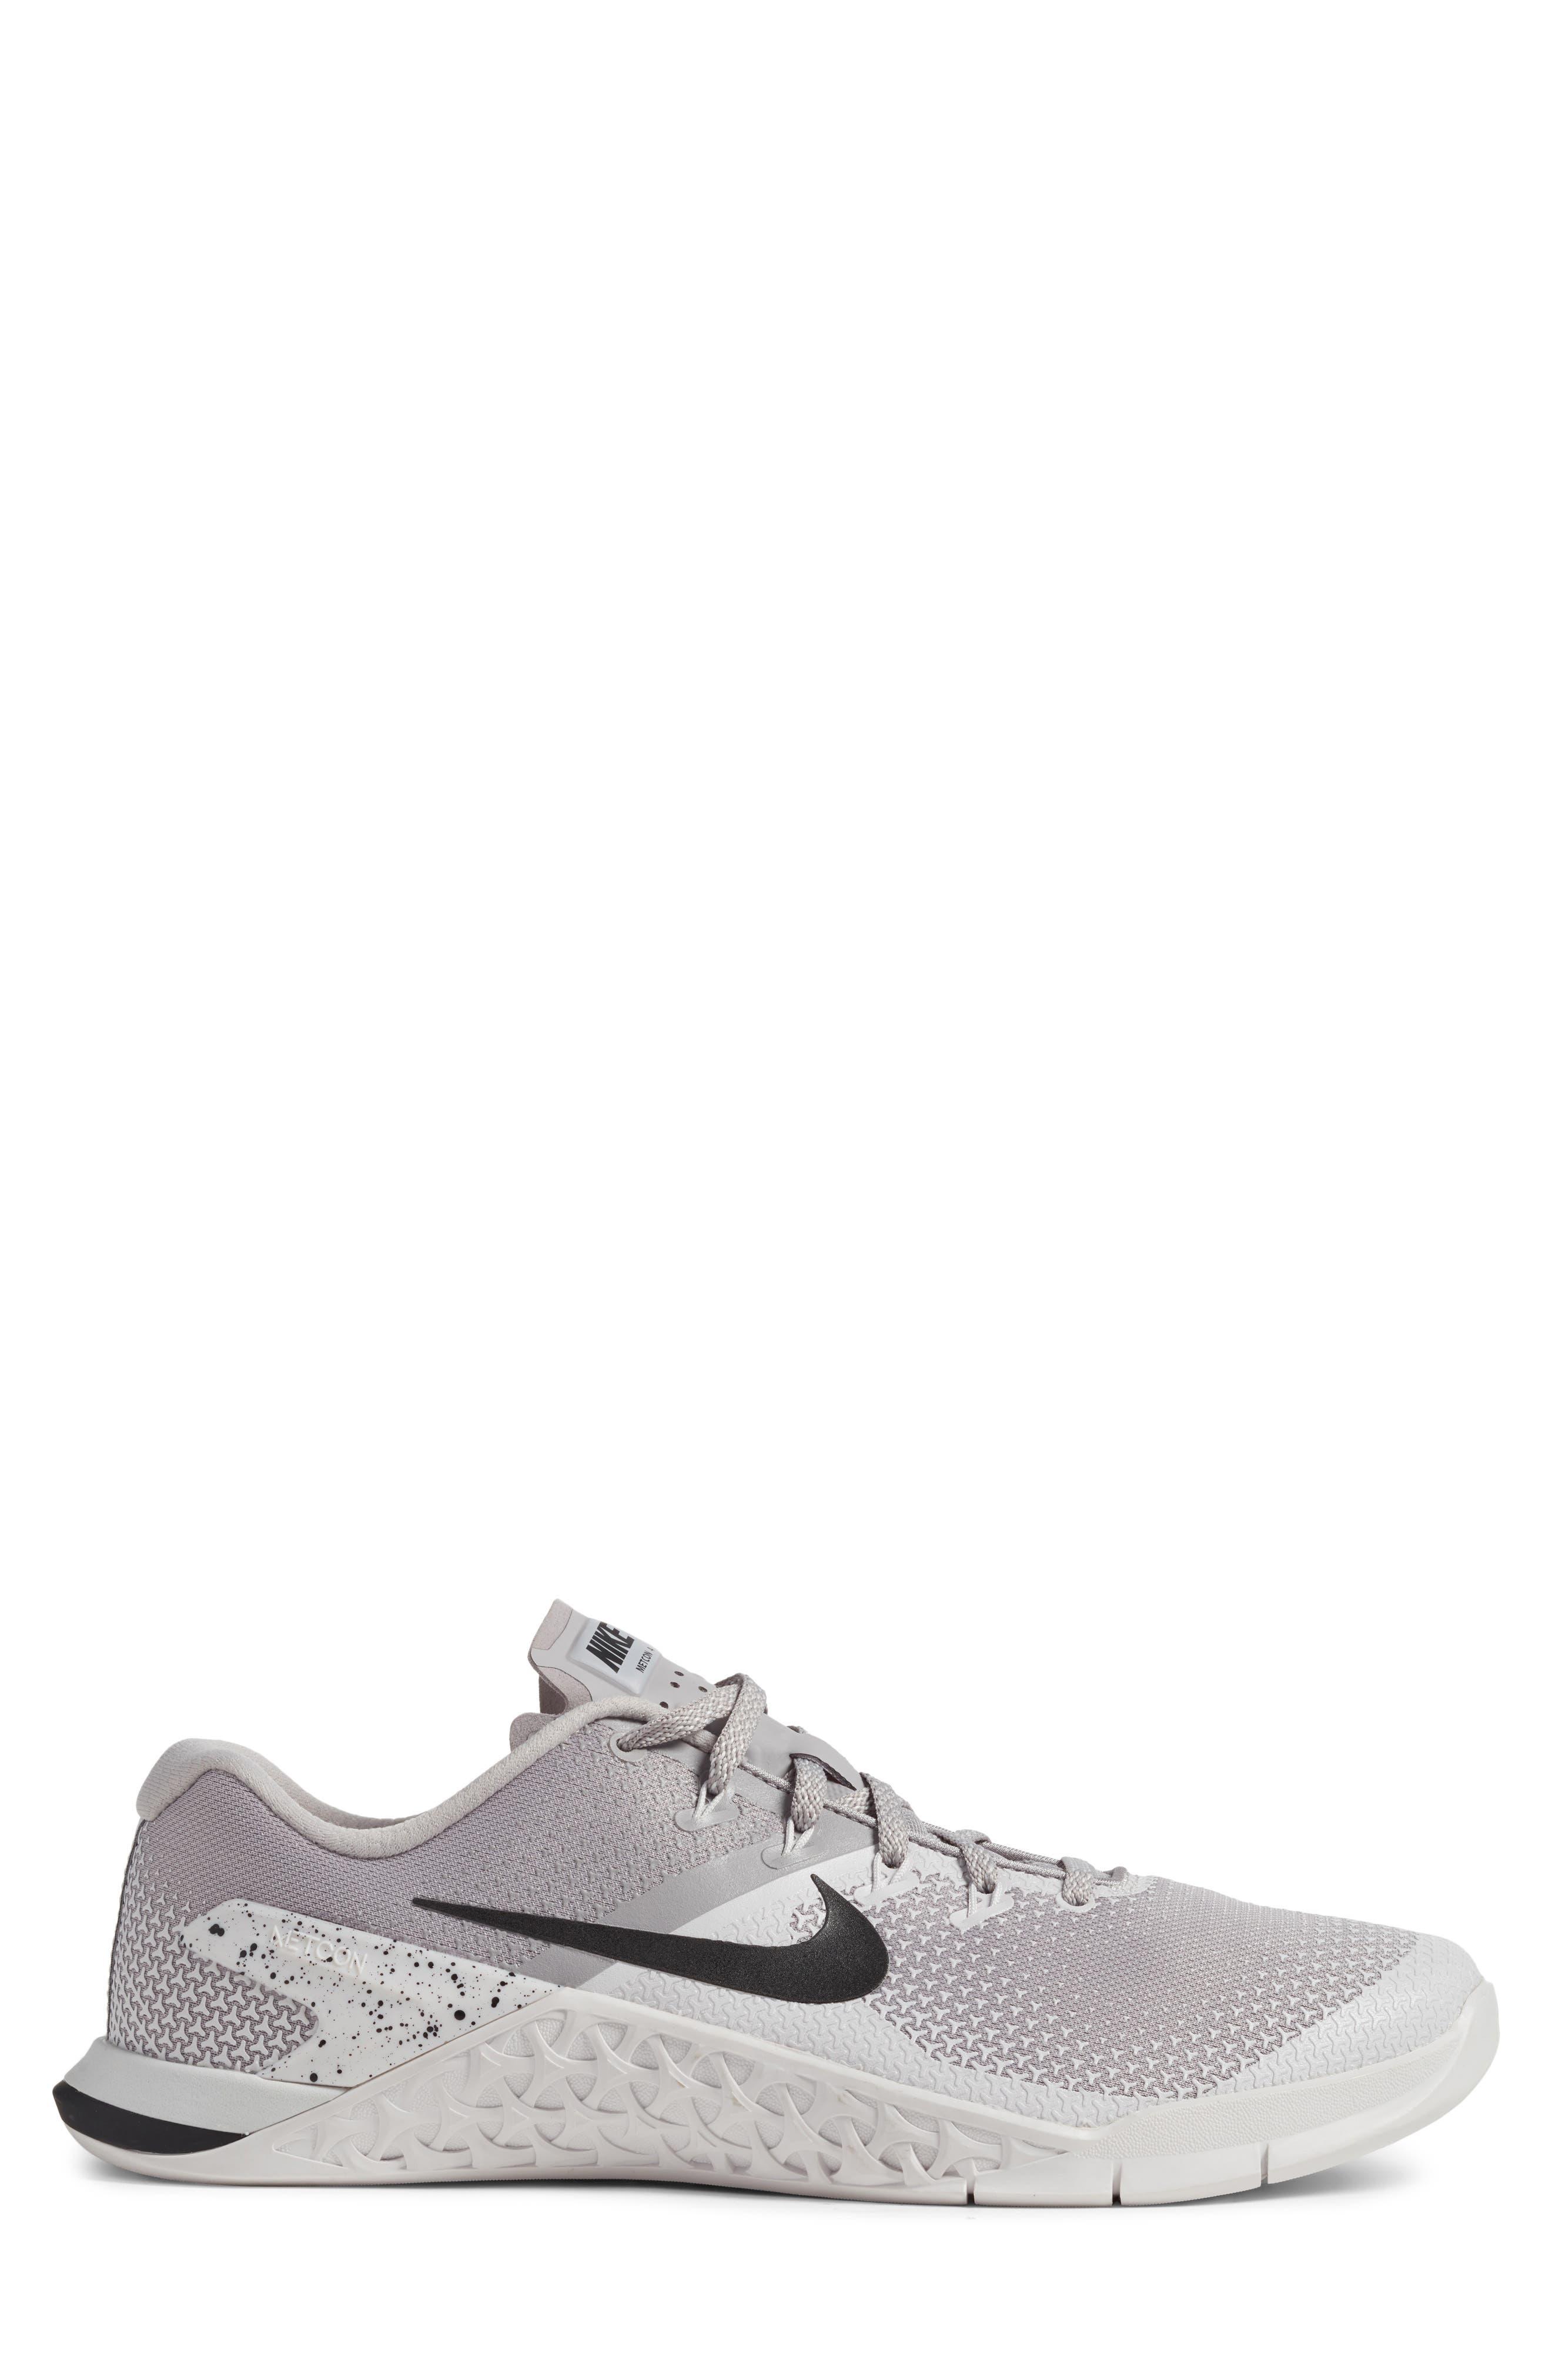 Metcon 4 Training Shoe,                             Alternate thumbnail 3, color,                             ATMOSPHERE GREY/ BLACK